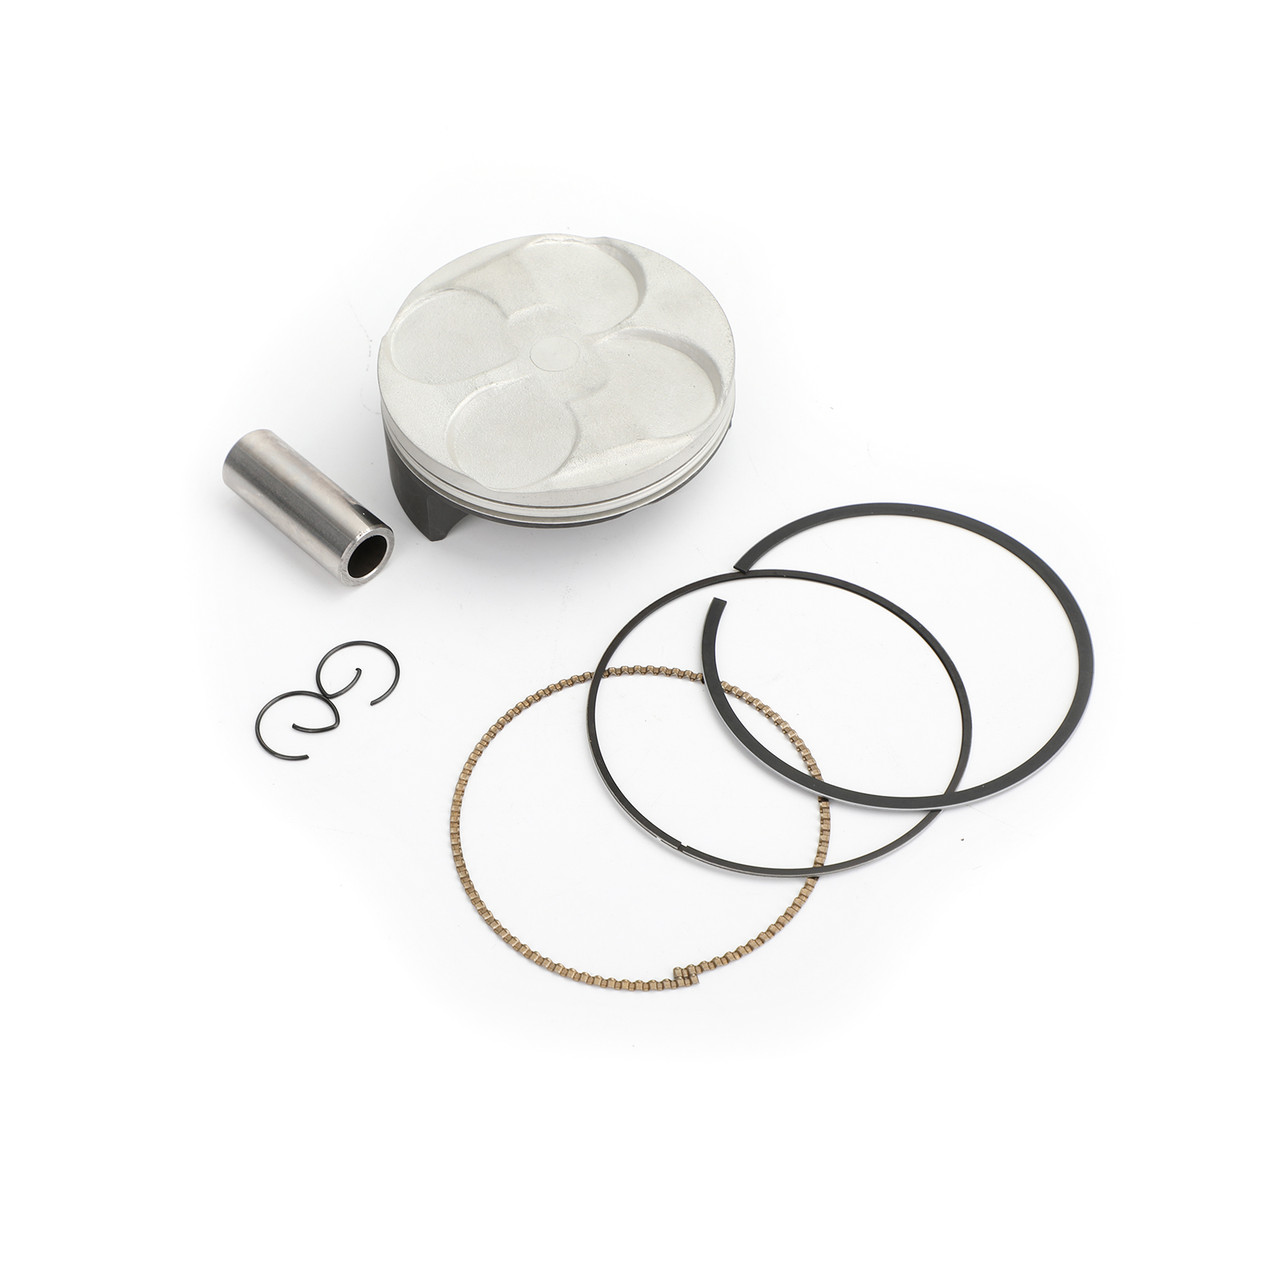 Piston Rings Pin Clips Kit 78mm For Honda CRF250R CRF250X 04-06 13101-KRN-670